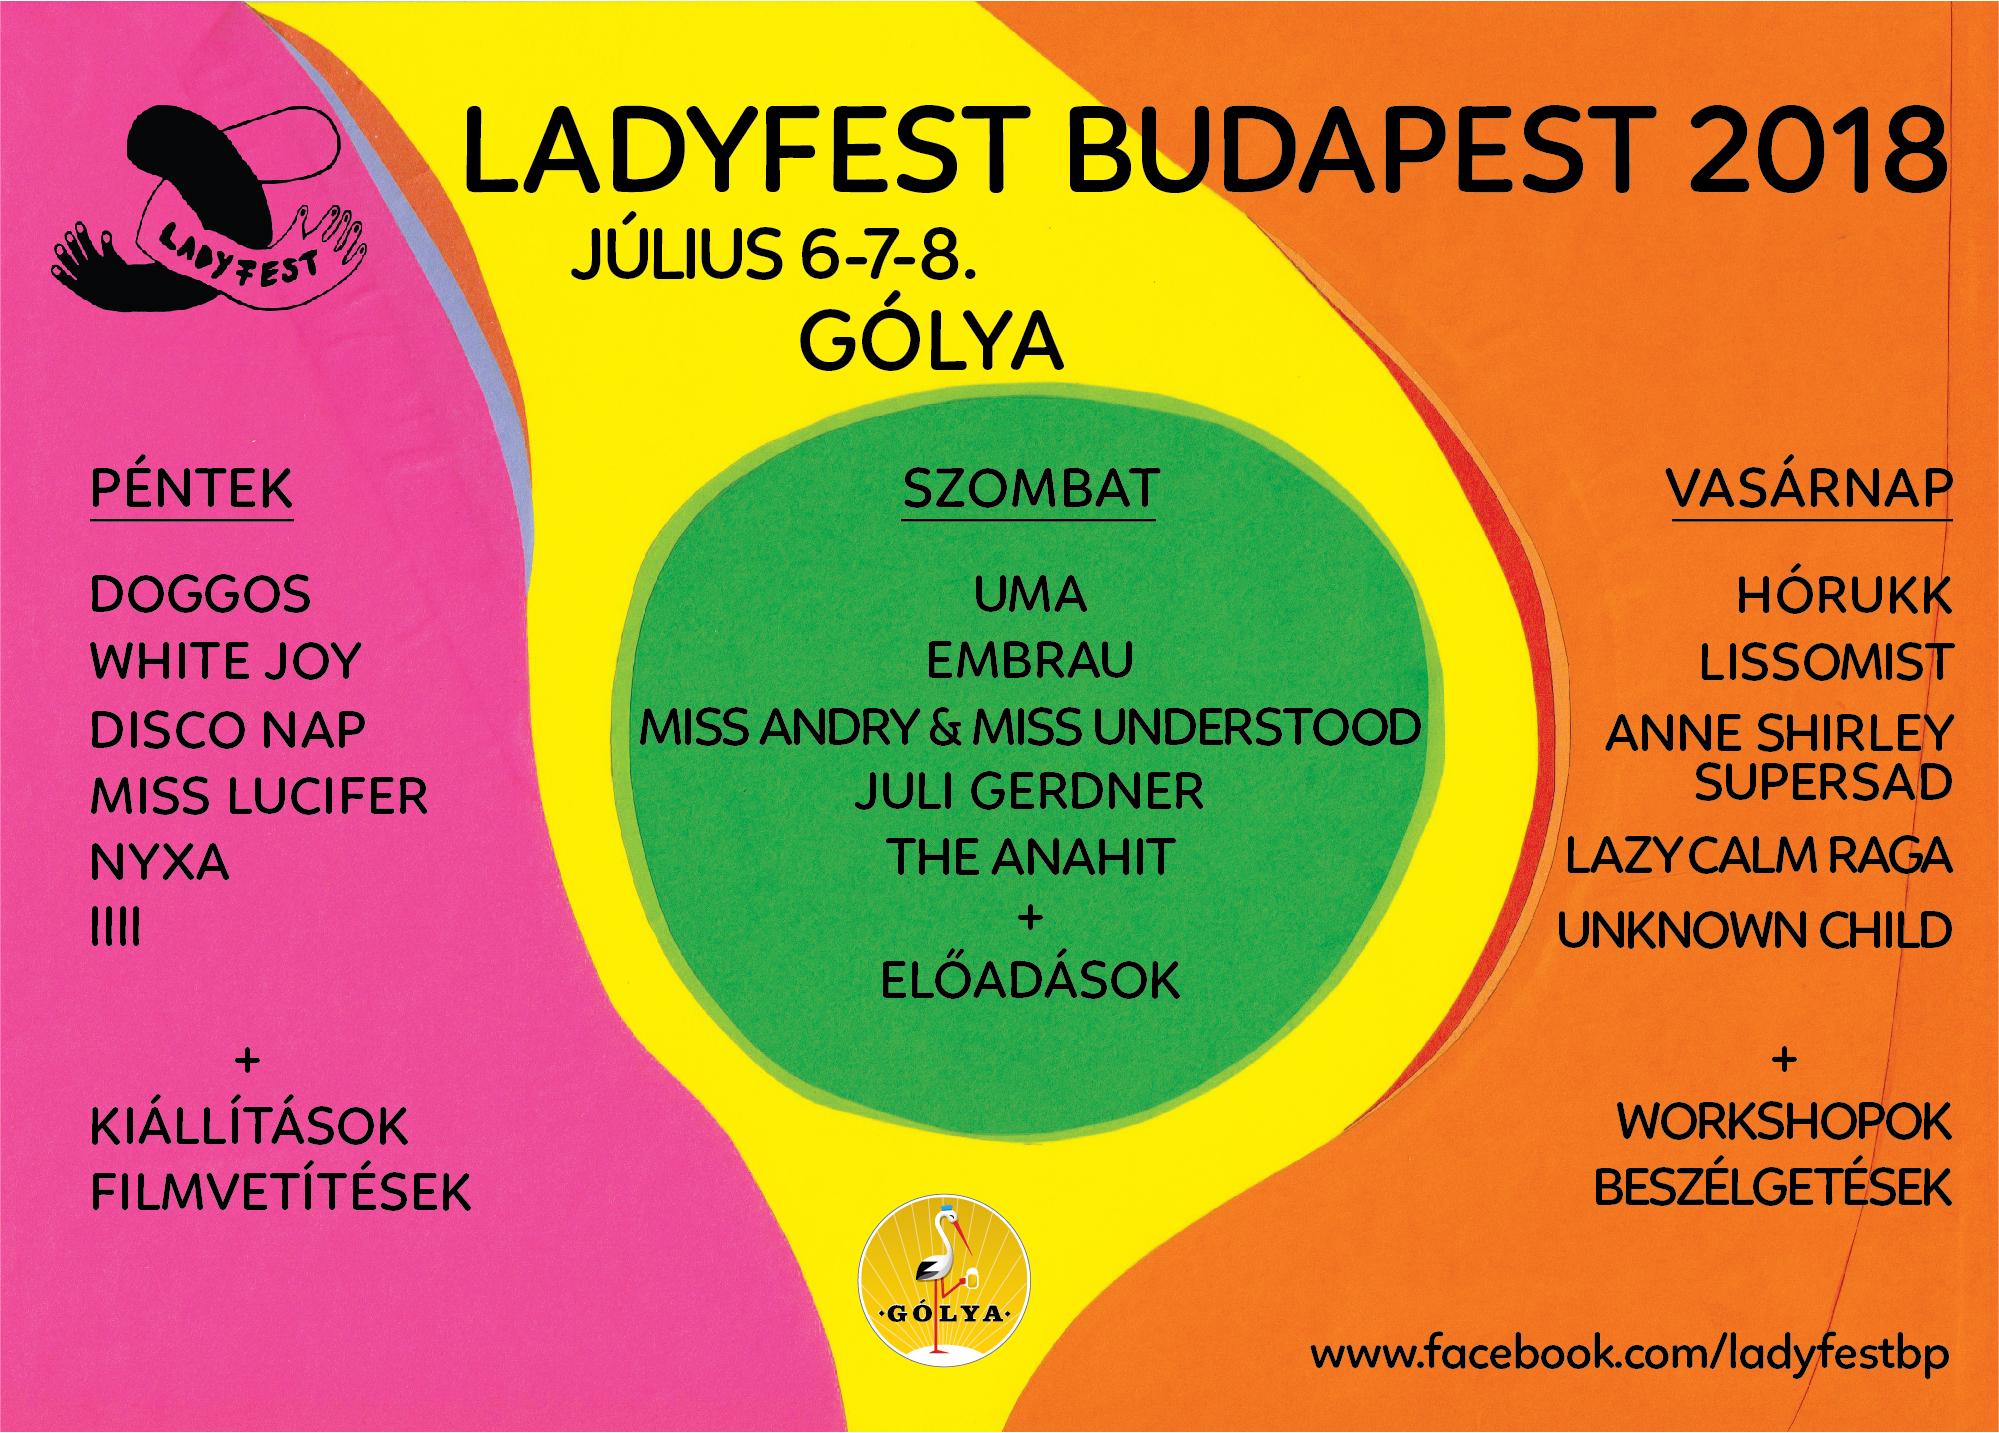 keszladyfestbudapest2018_web_72dpi.jpg